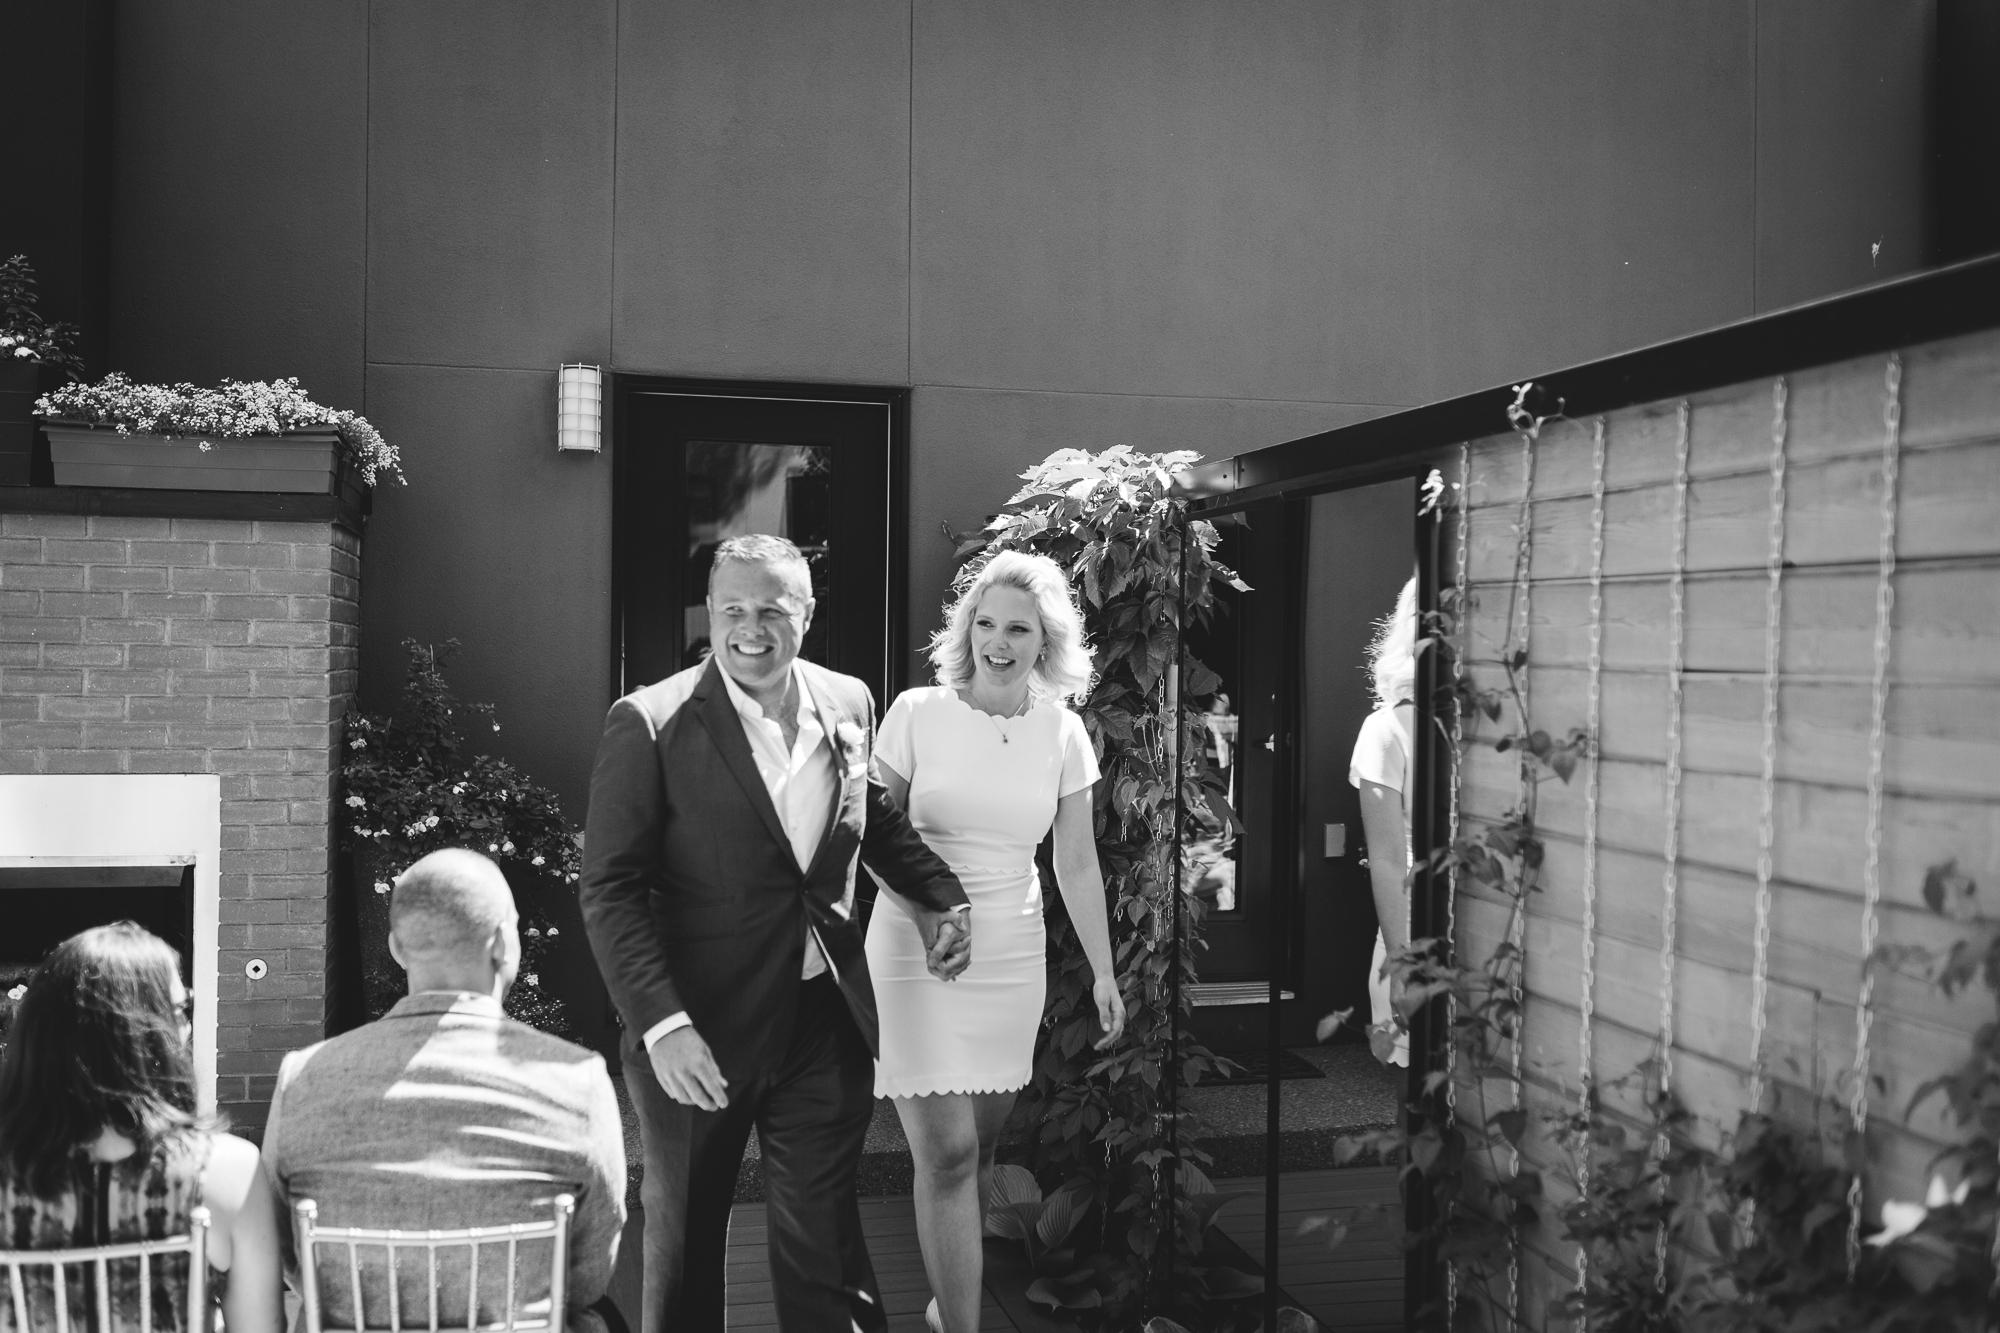 Calgary-wedding-photographer-CG-35.jpg